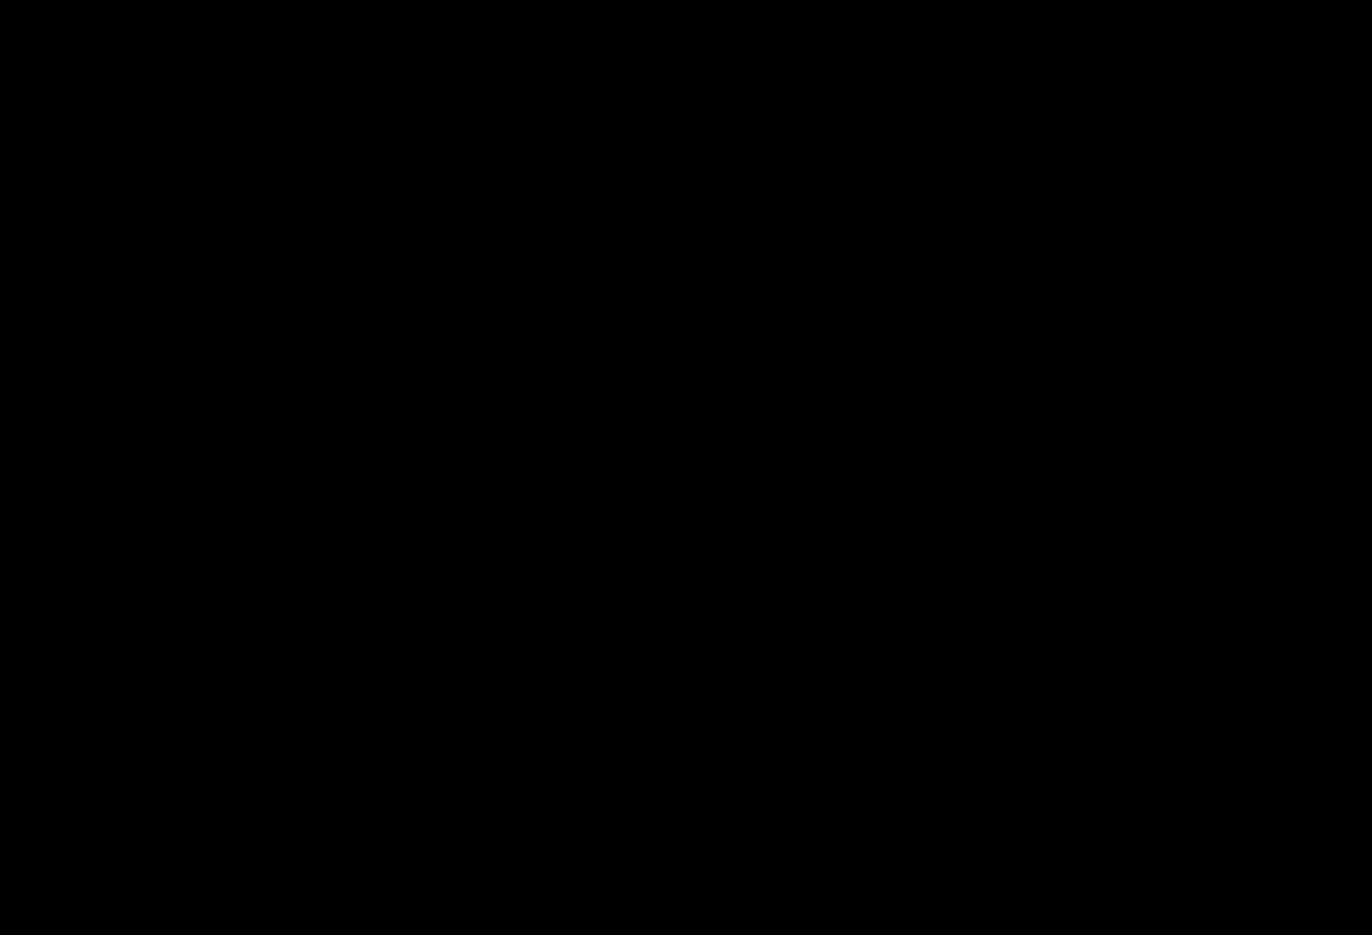 Masterclass Kimchipotten draaien op vrijdag 21 januari en 11 februari 2022